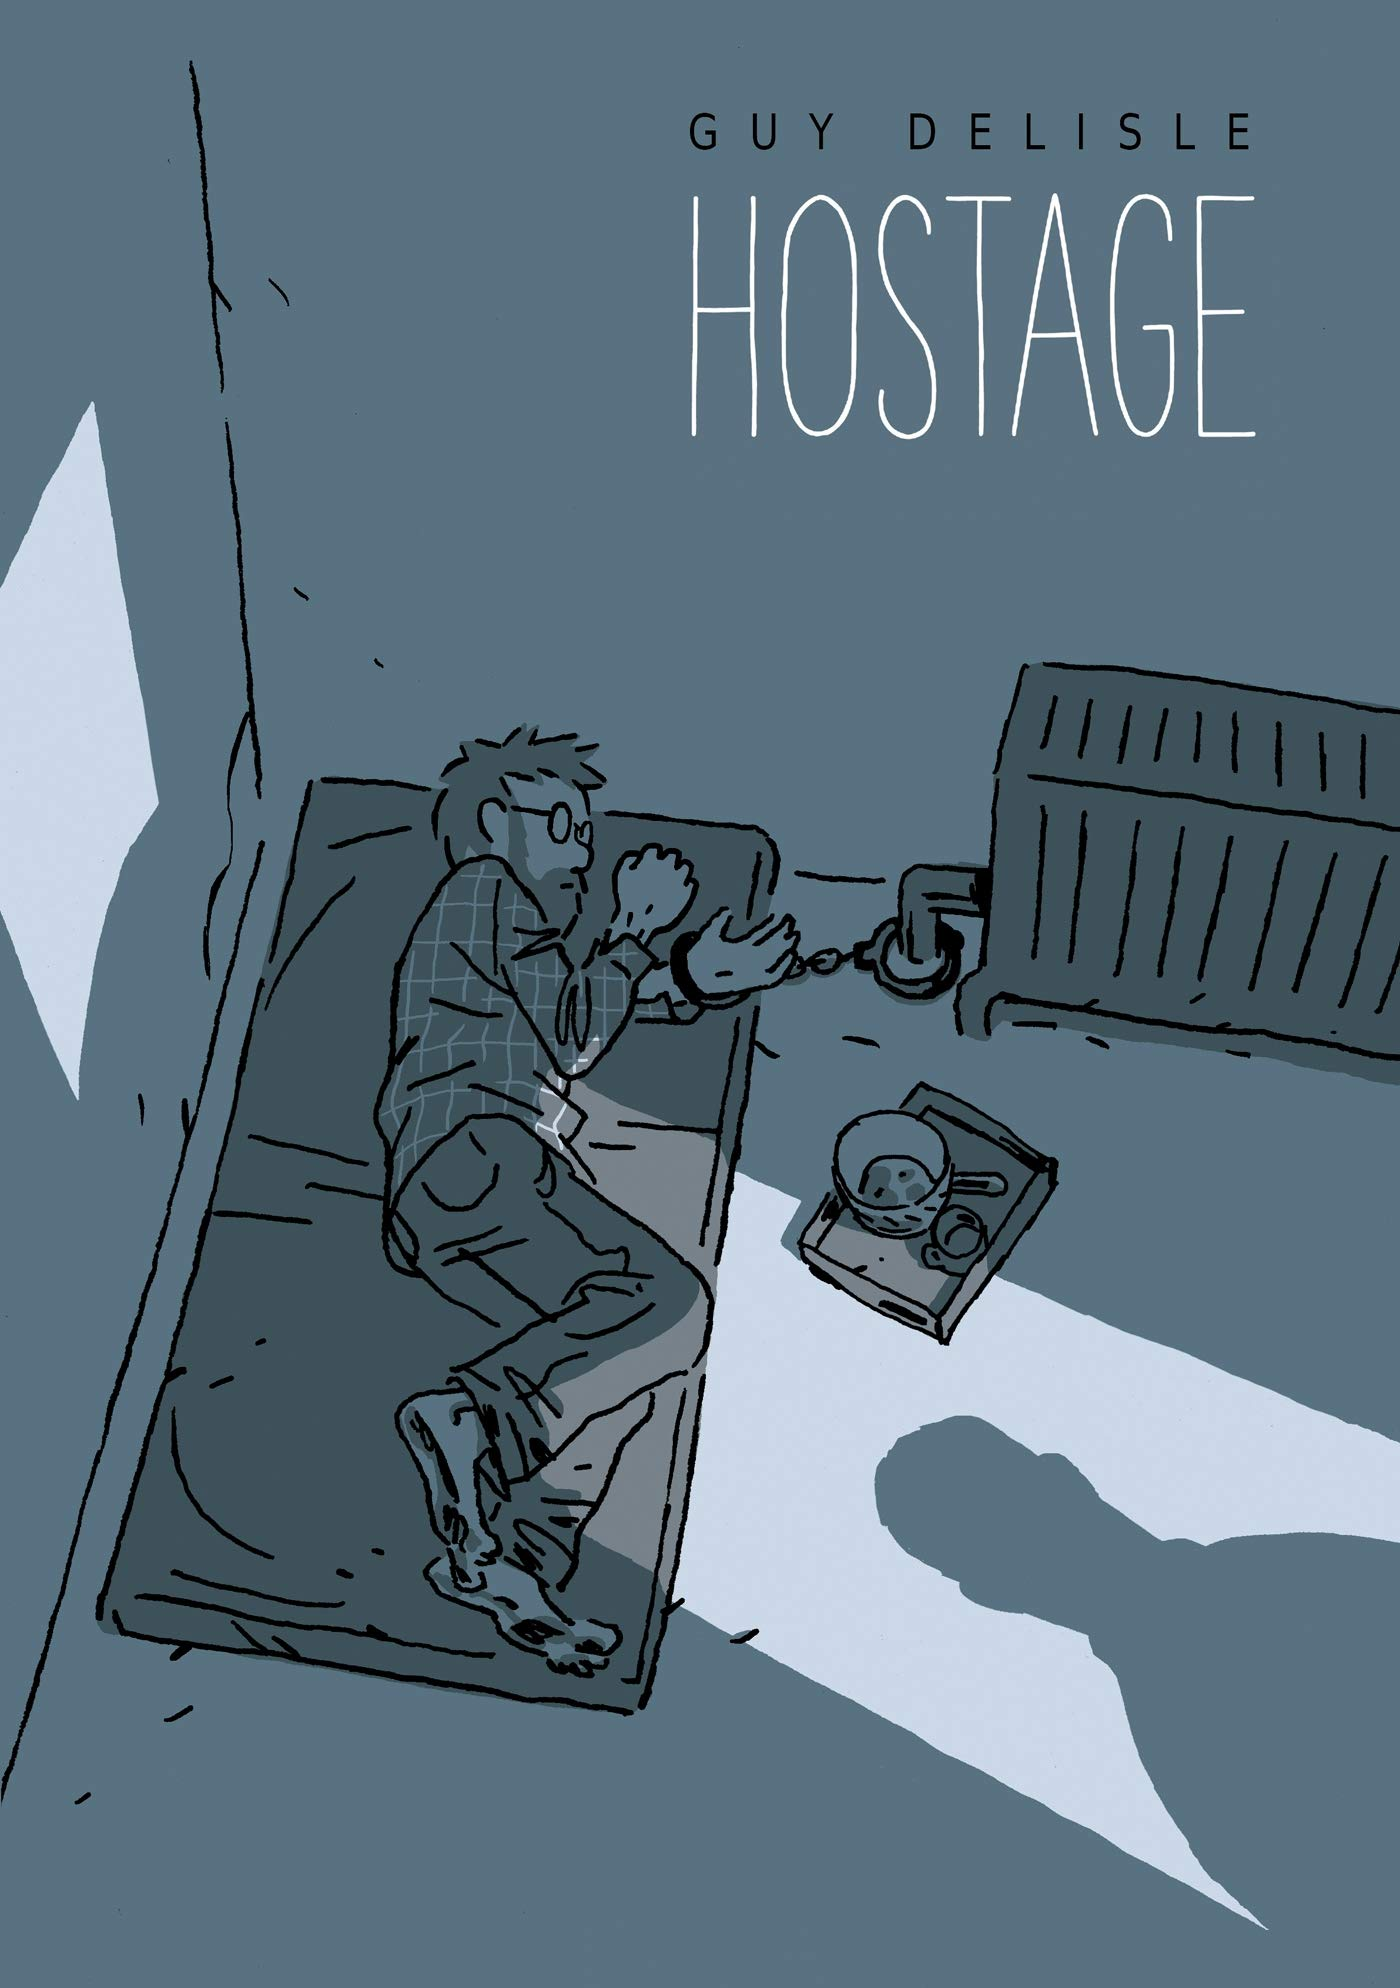 Hostage: Delisle, Guy, Dascher, Helge: 9781770462793: Amazon.com: Books